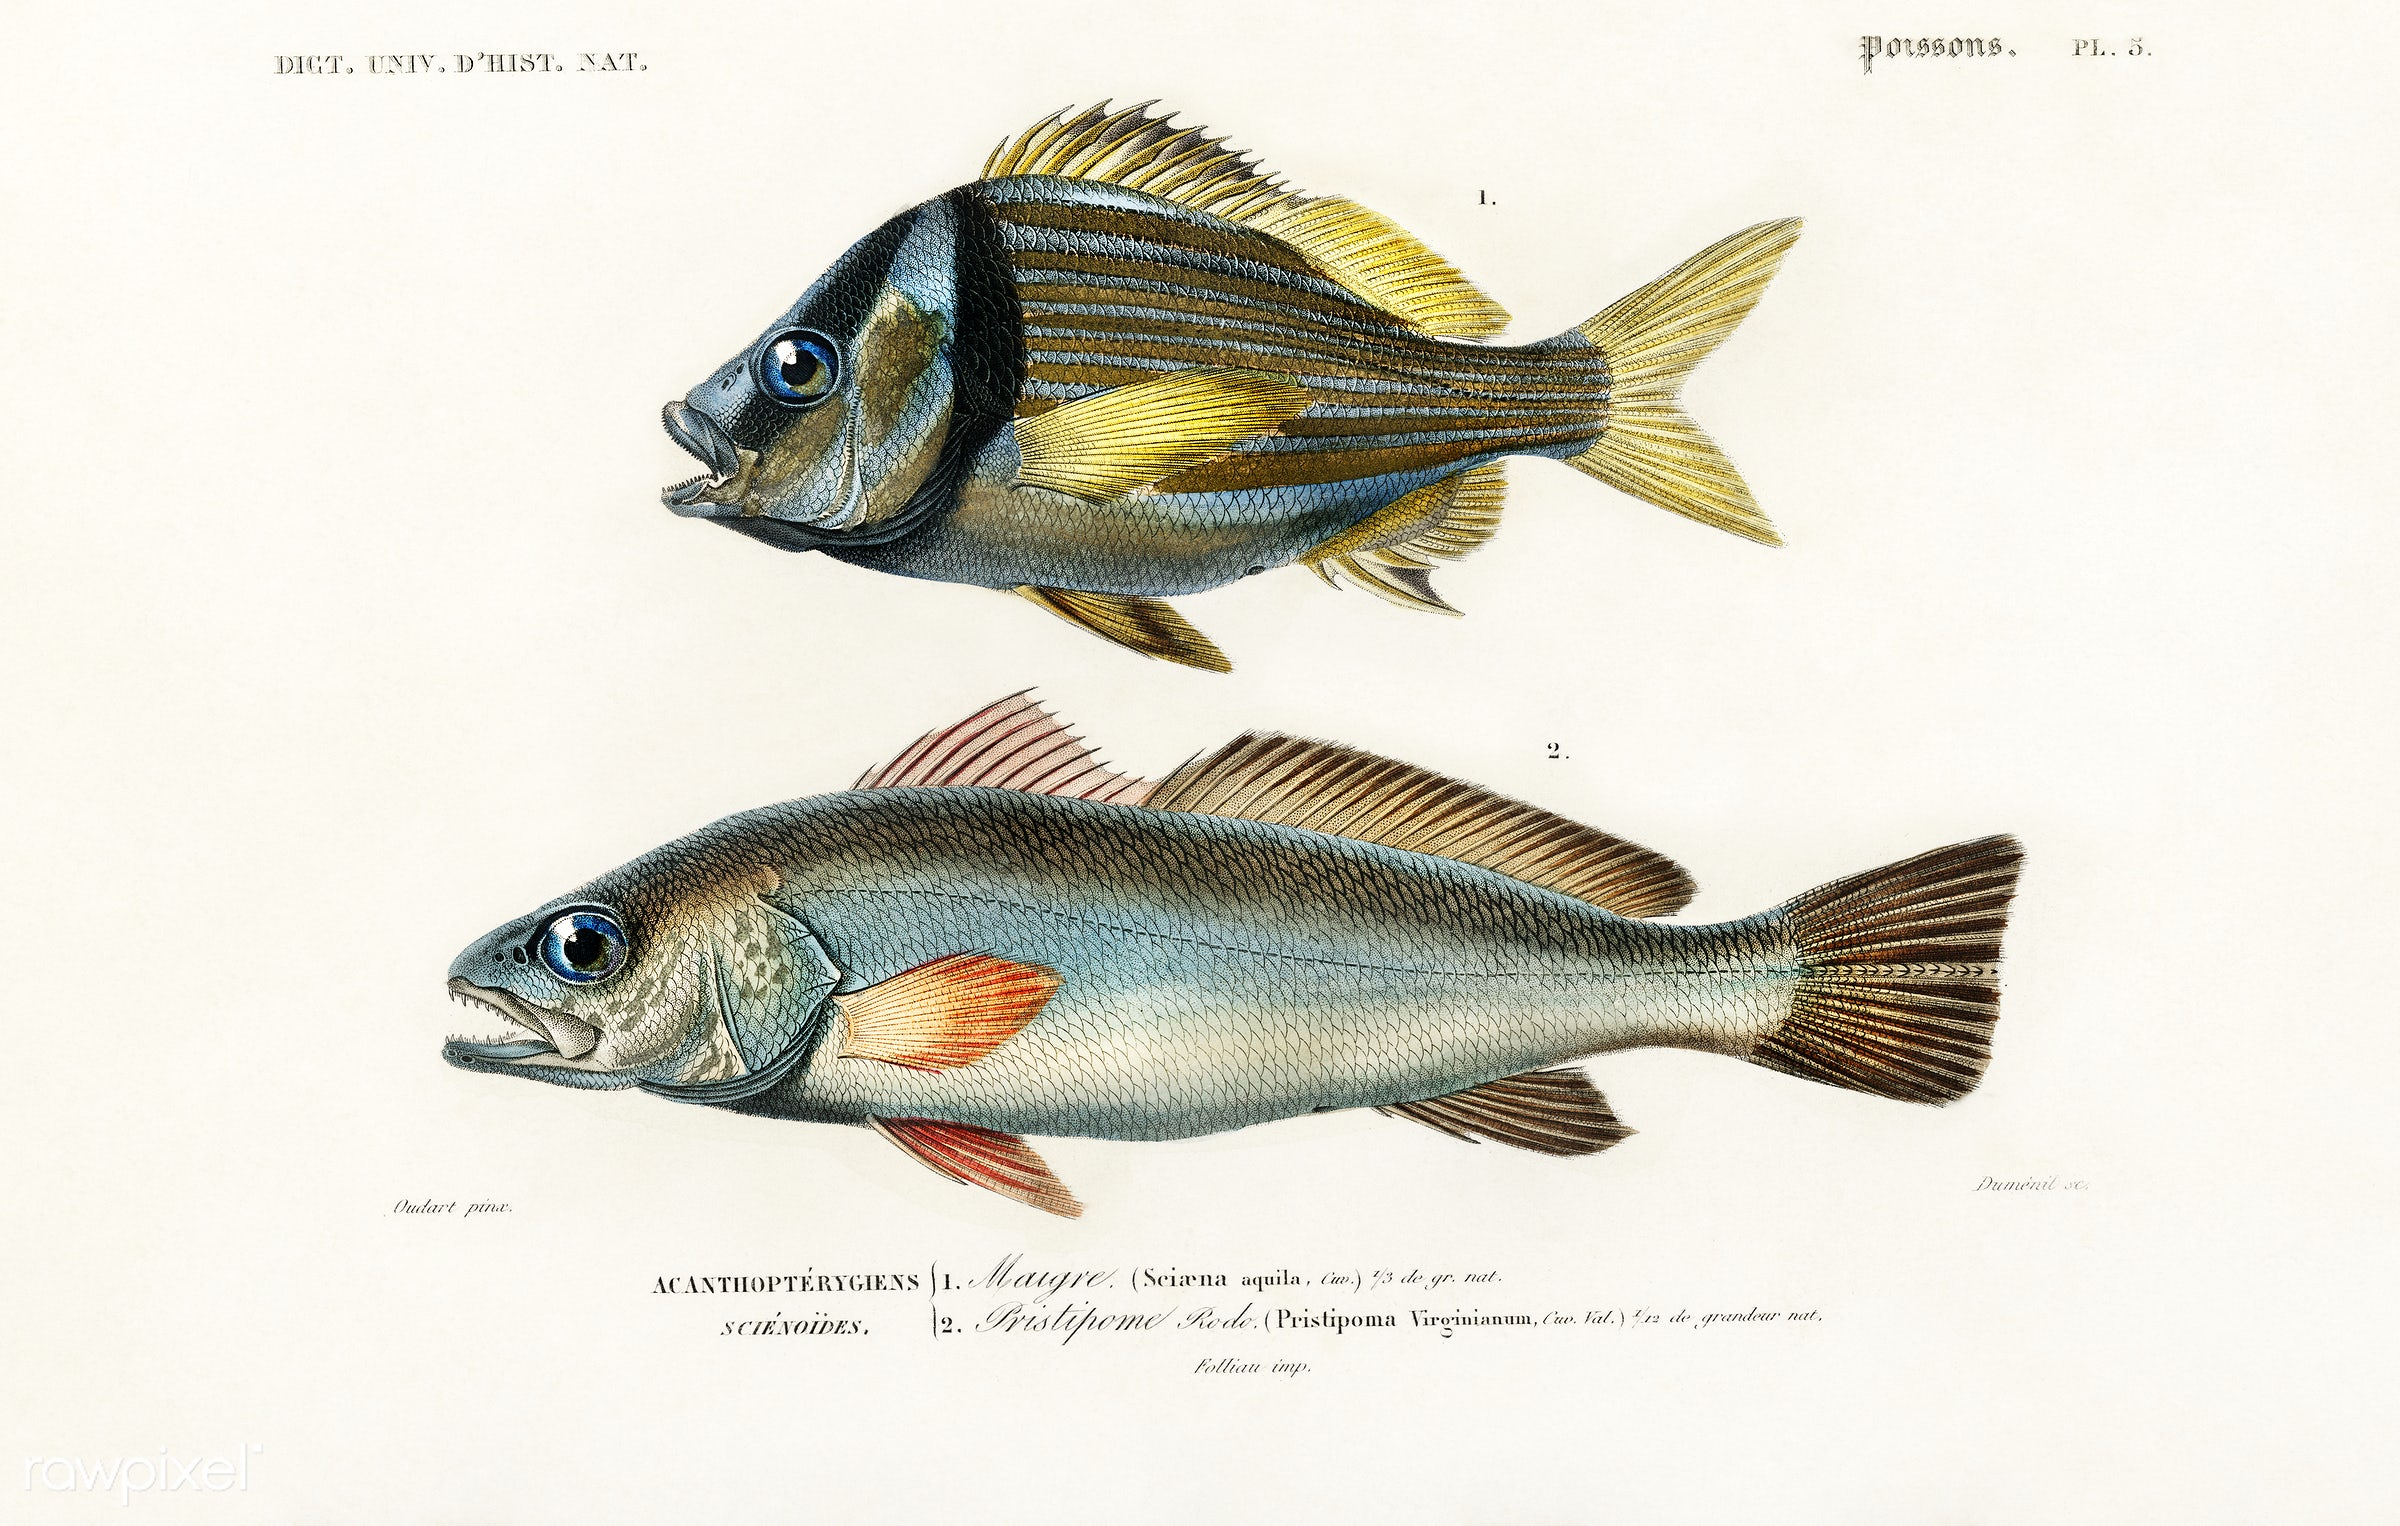 Porkfish (Pristipoma virginianum) and Shade-fish (Sciaena aquila) illustrated by Charles Dessalines D' Orbigny (1806-...